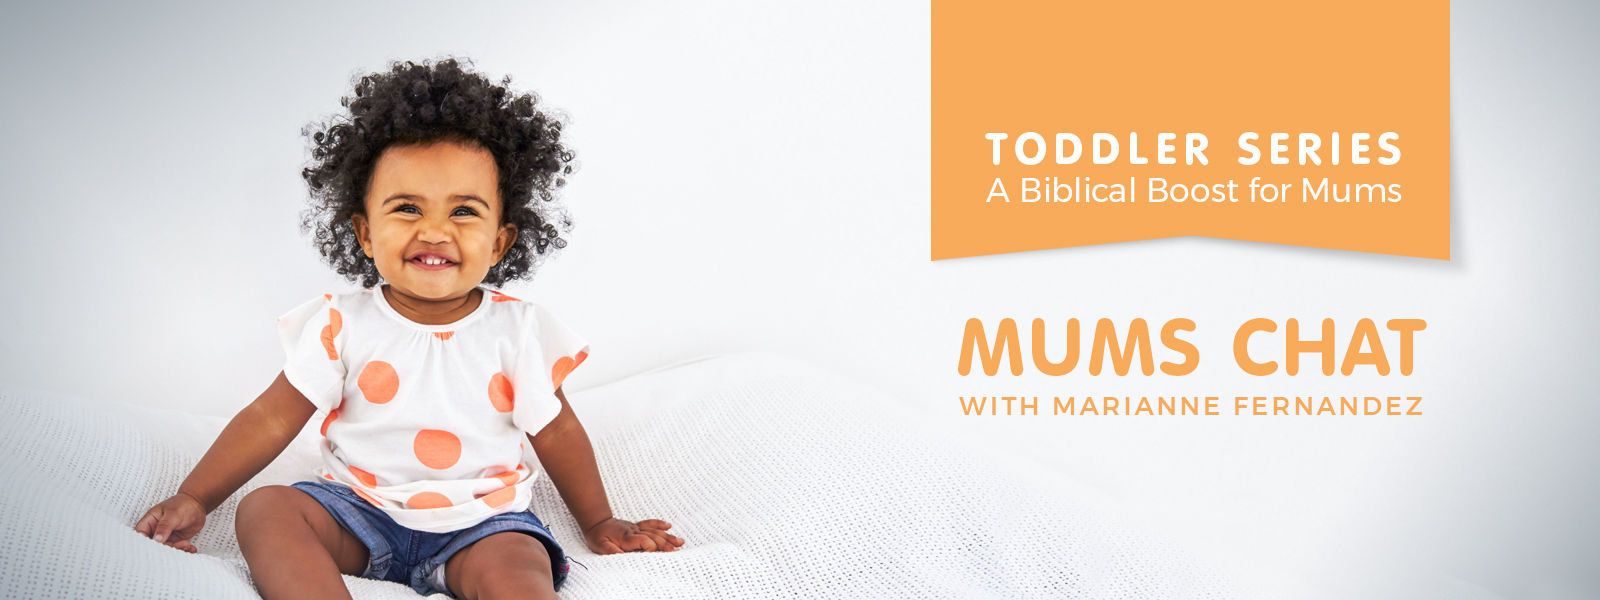 Mums Chat - Toddler Series